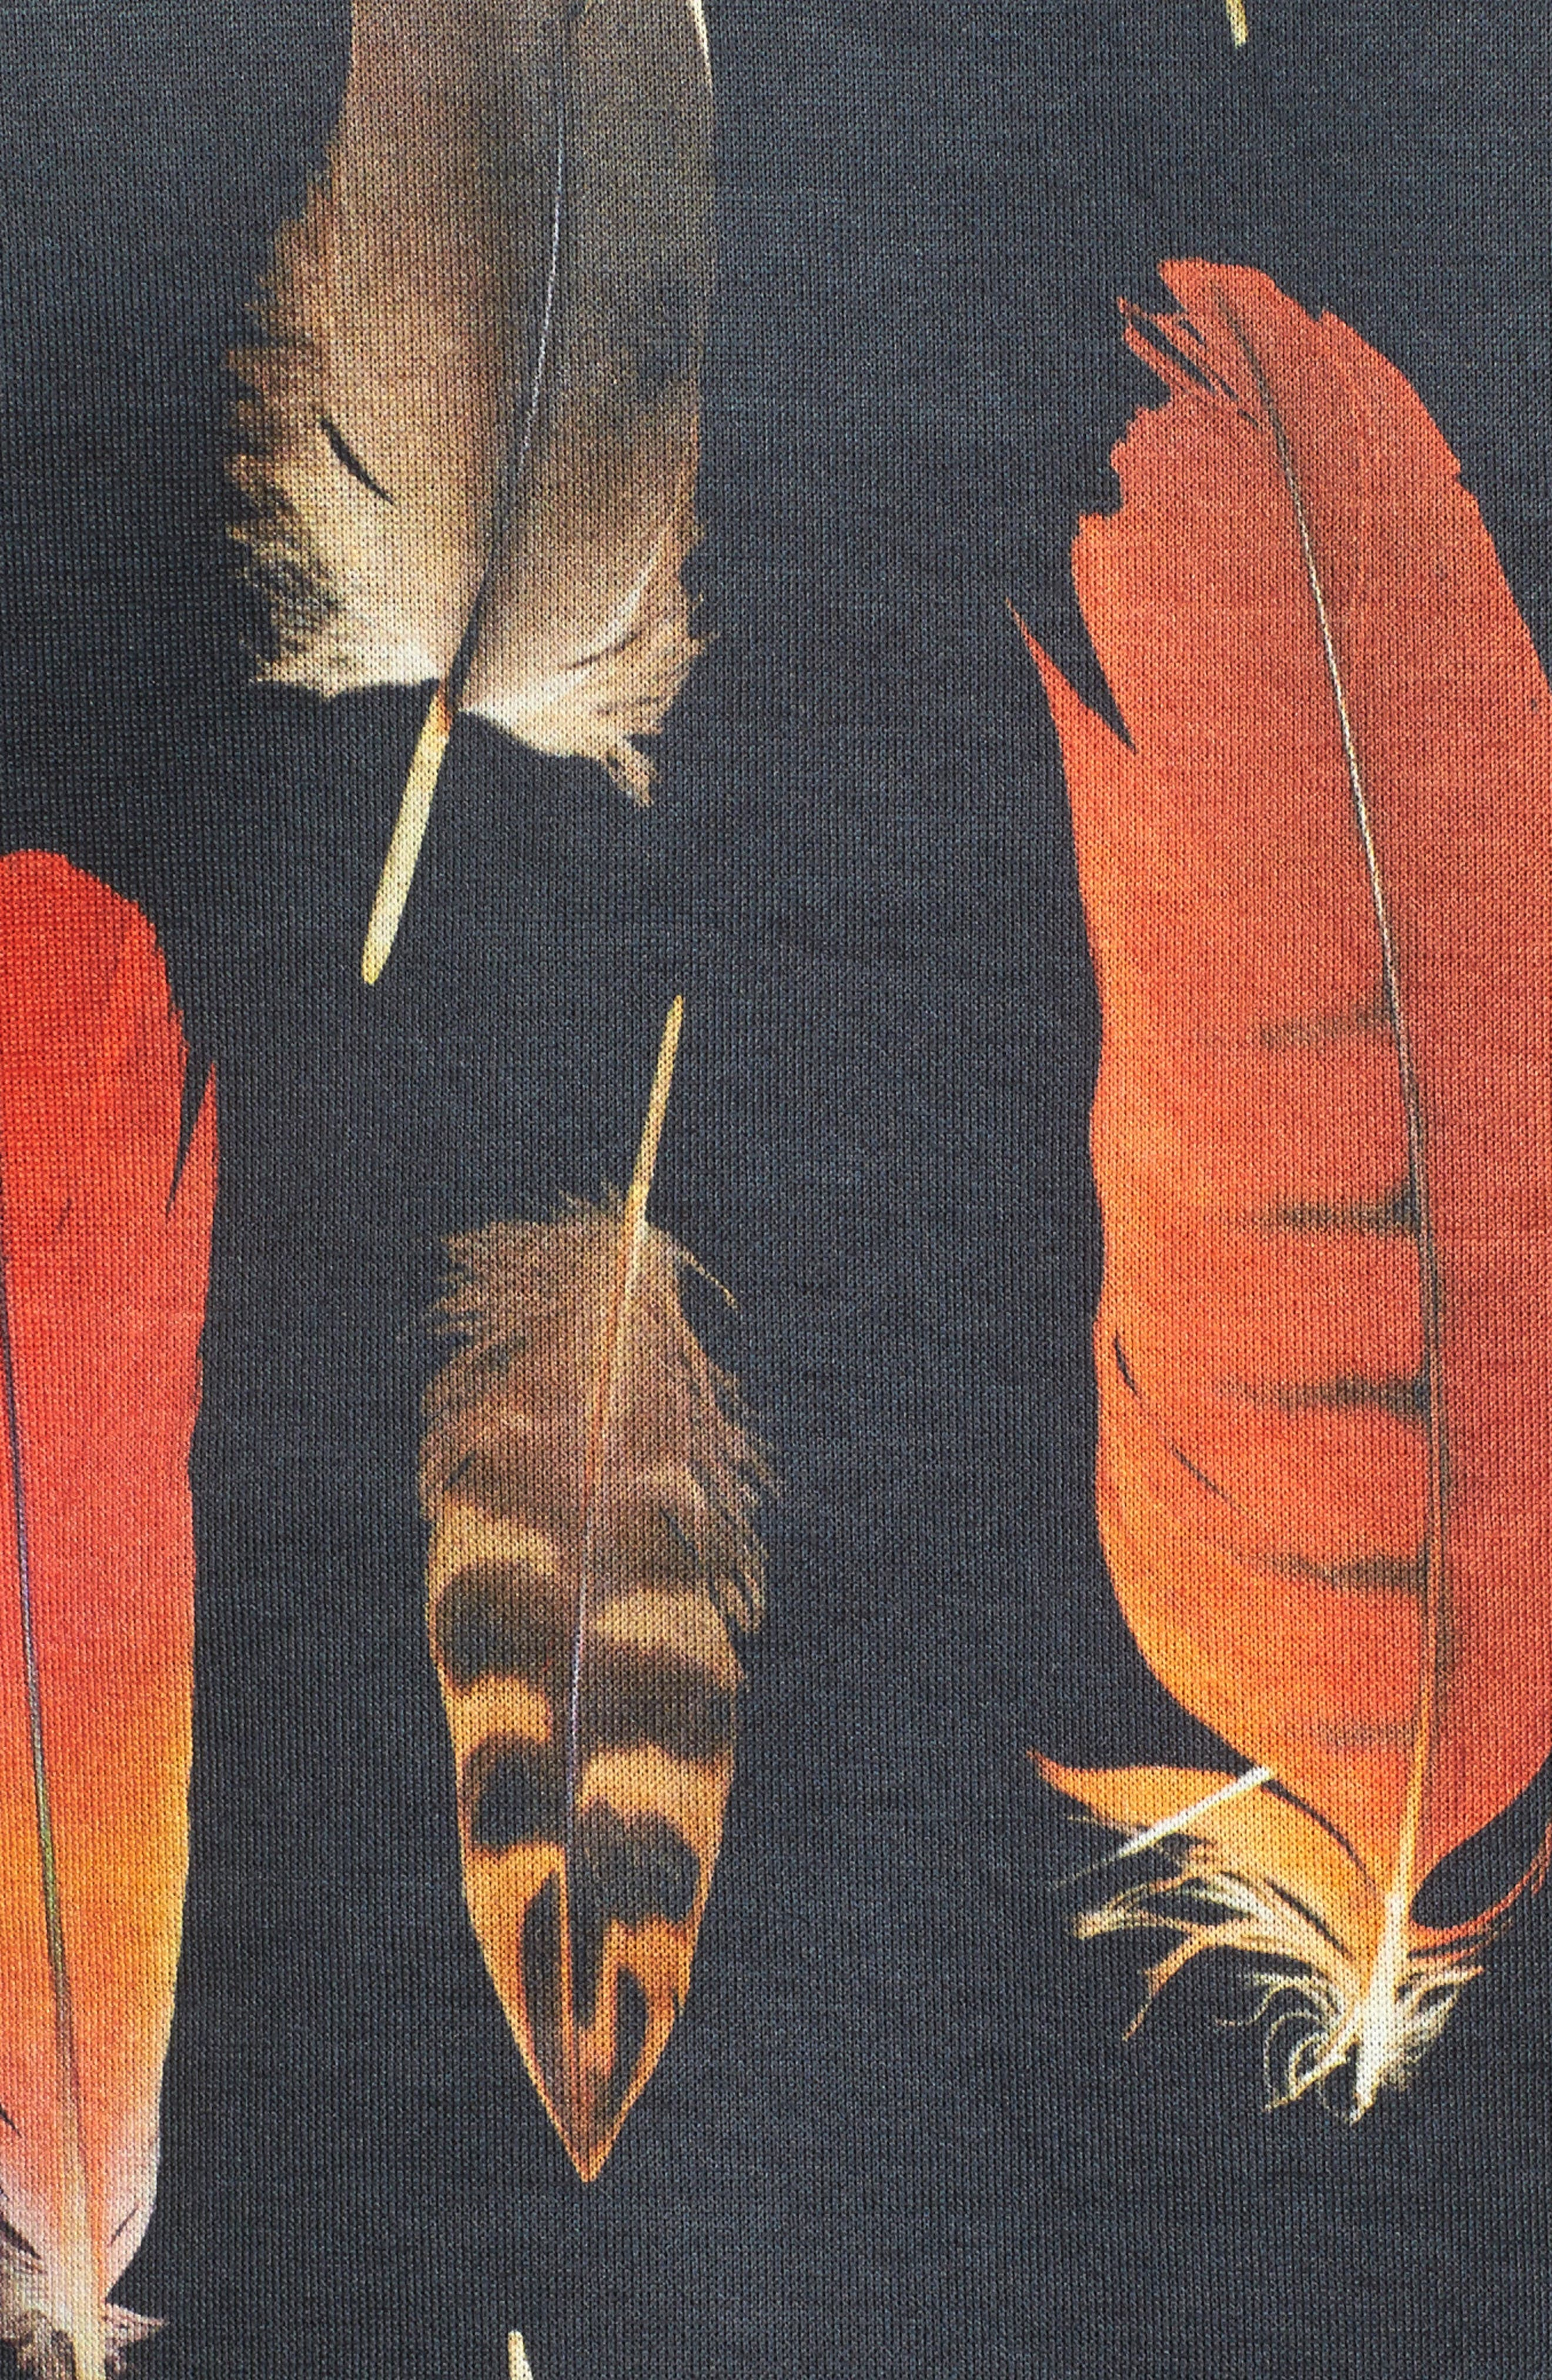 Feather Print T-Shirt,                             Alternate thumbnail 5, color,                             Black